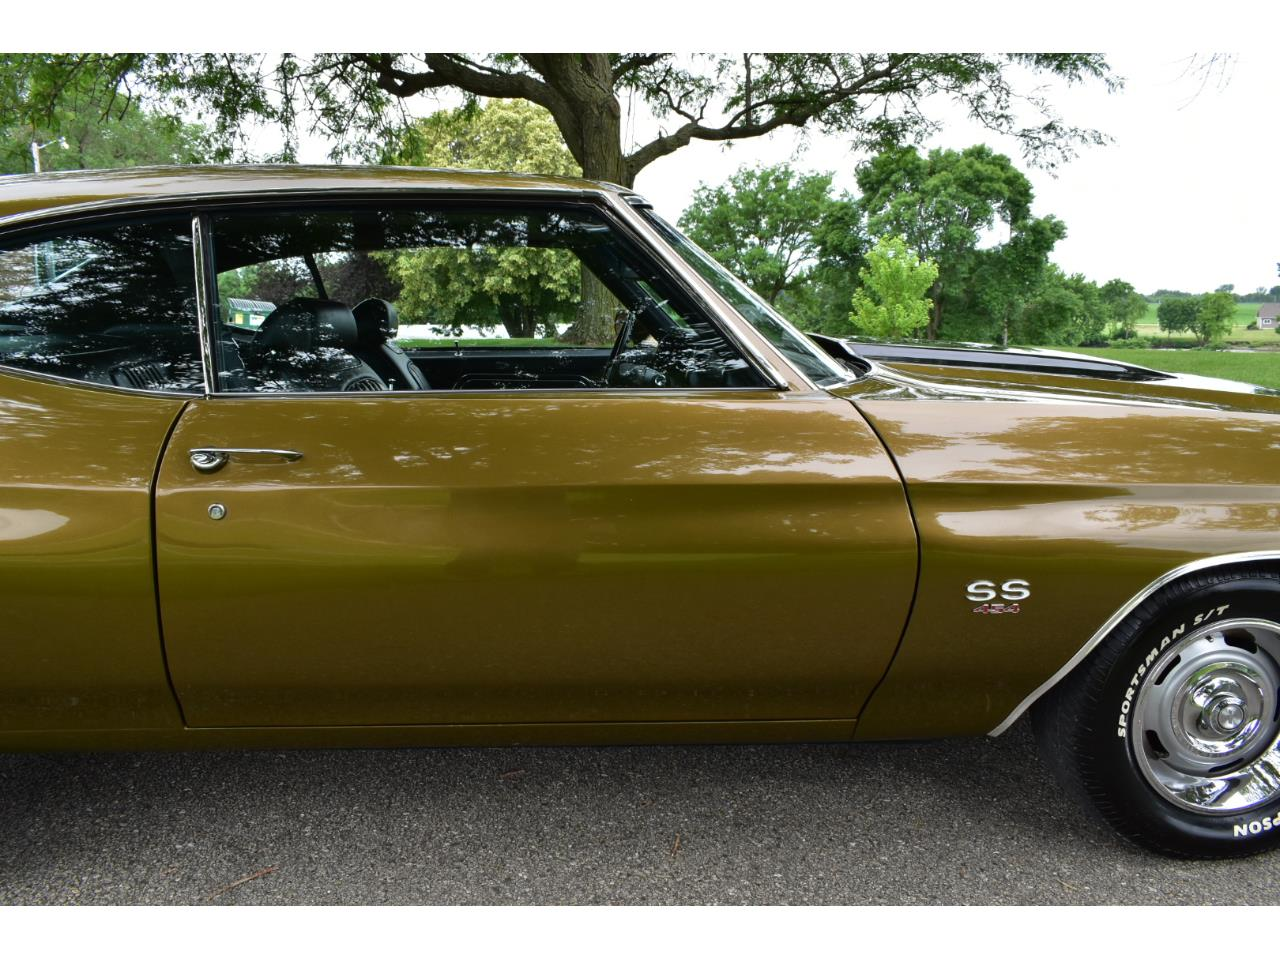 Large Picture of '72 Chevrolet Chevelle Malibu SS located in Iowa - $37,995.00 - QD08